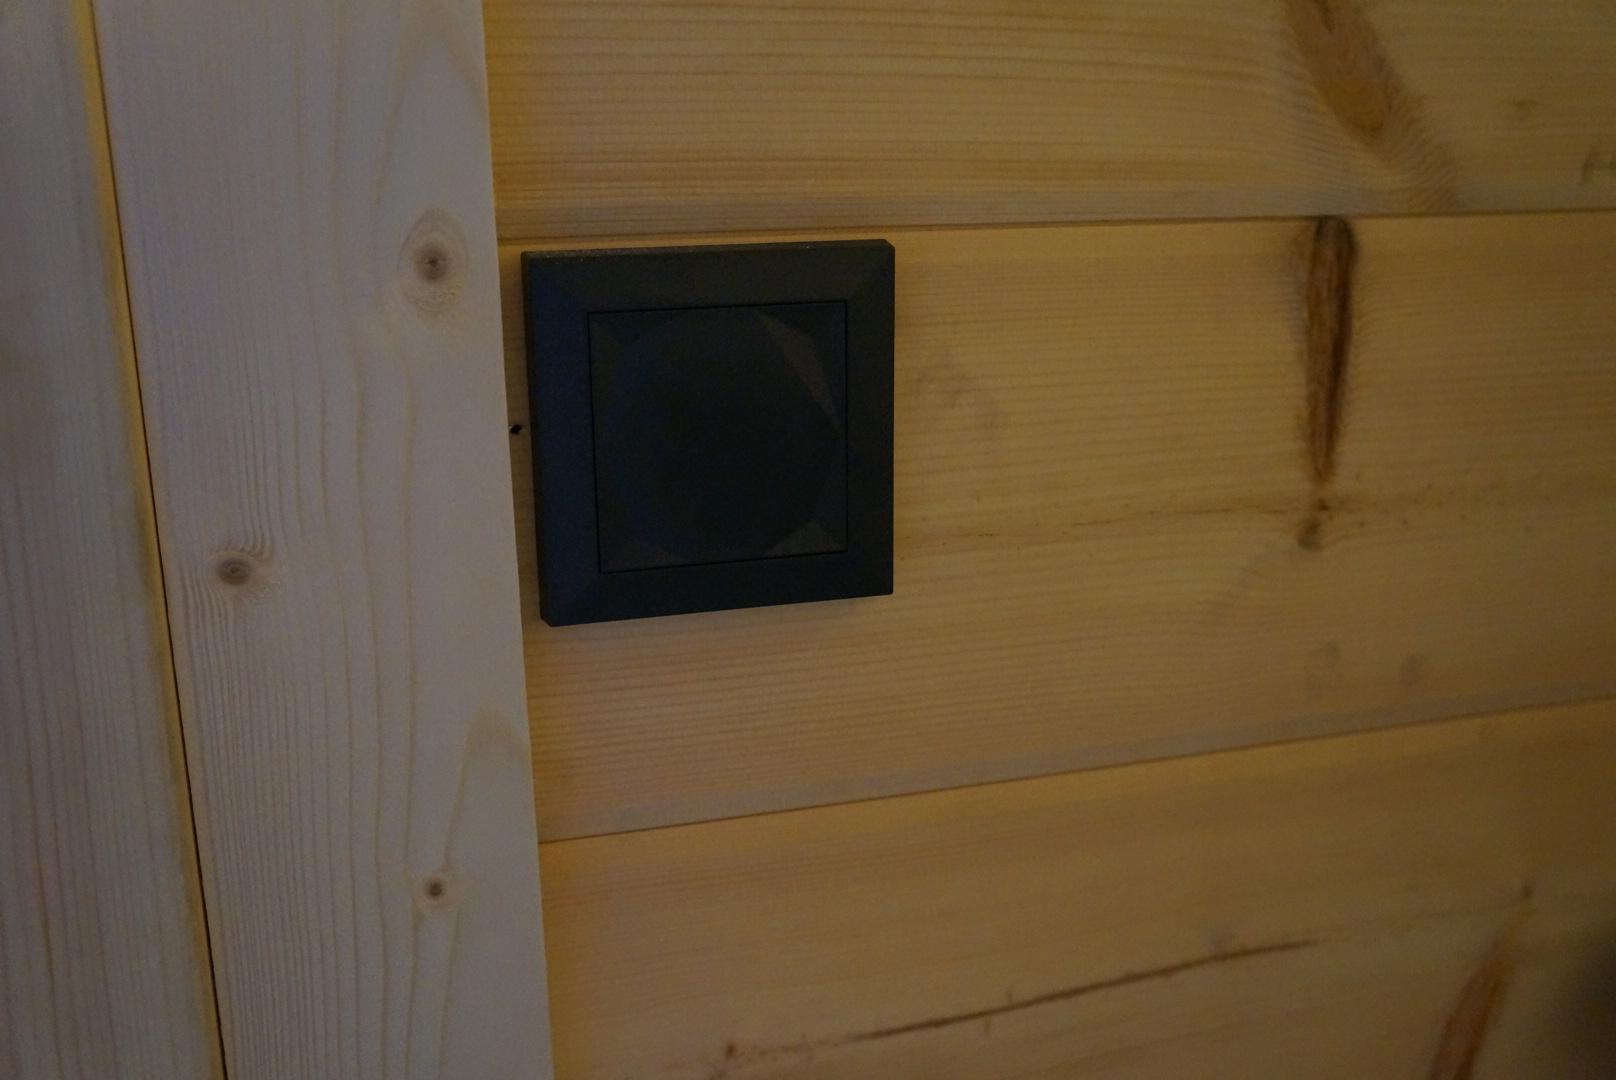 Smart BBQ Hut By XSYS Automation